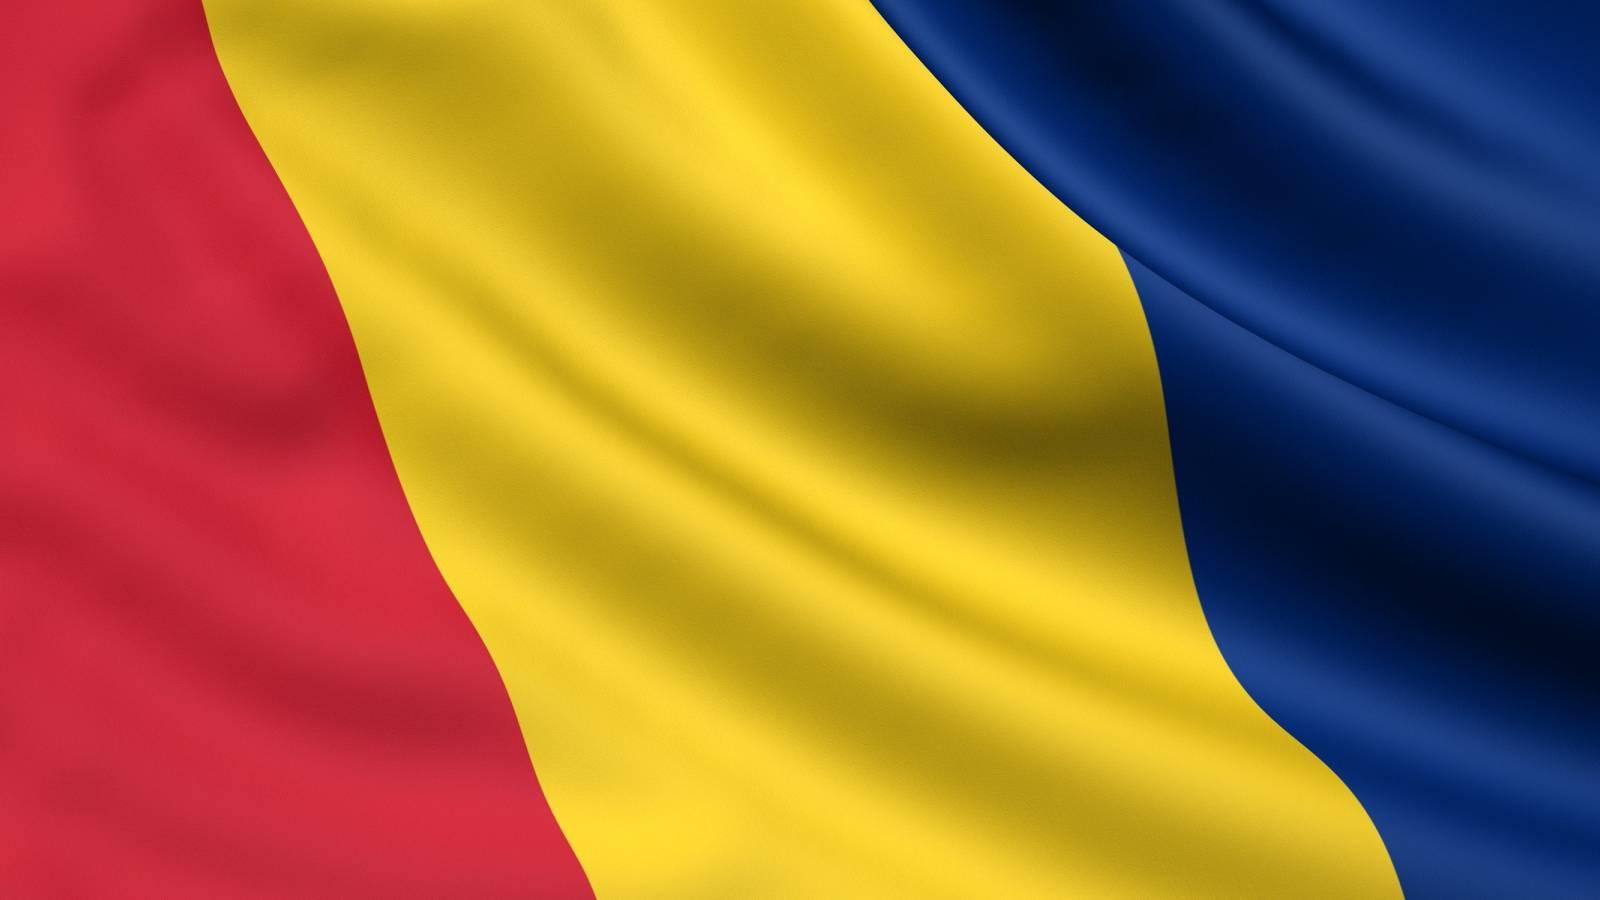 Romania Ingrijorare Cauza Variantei Delta Coronavirus